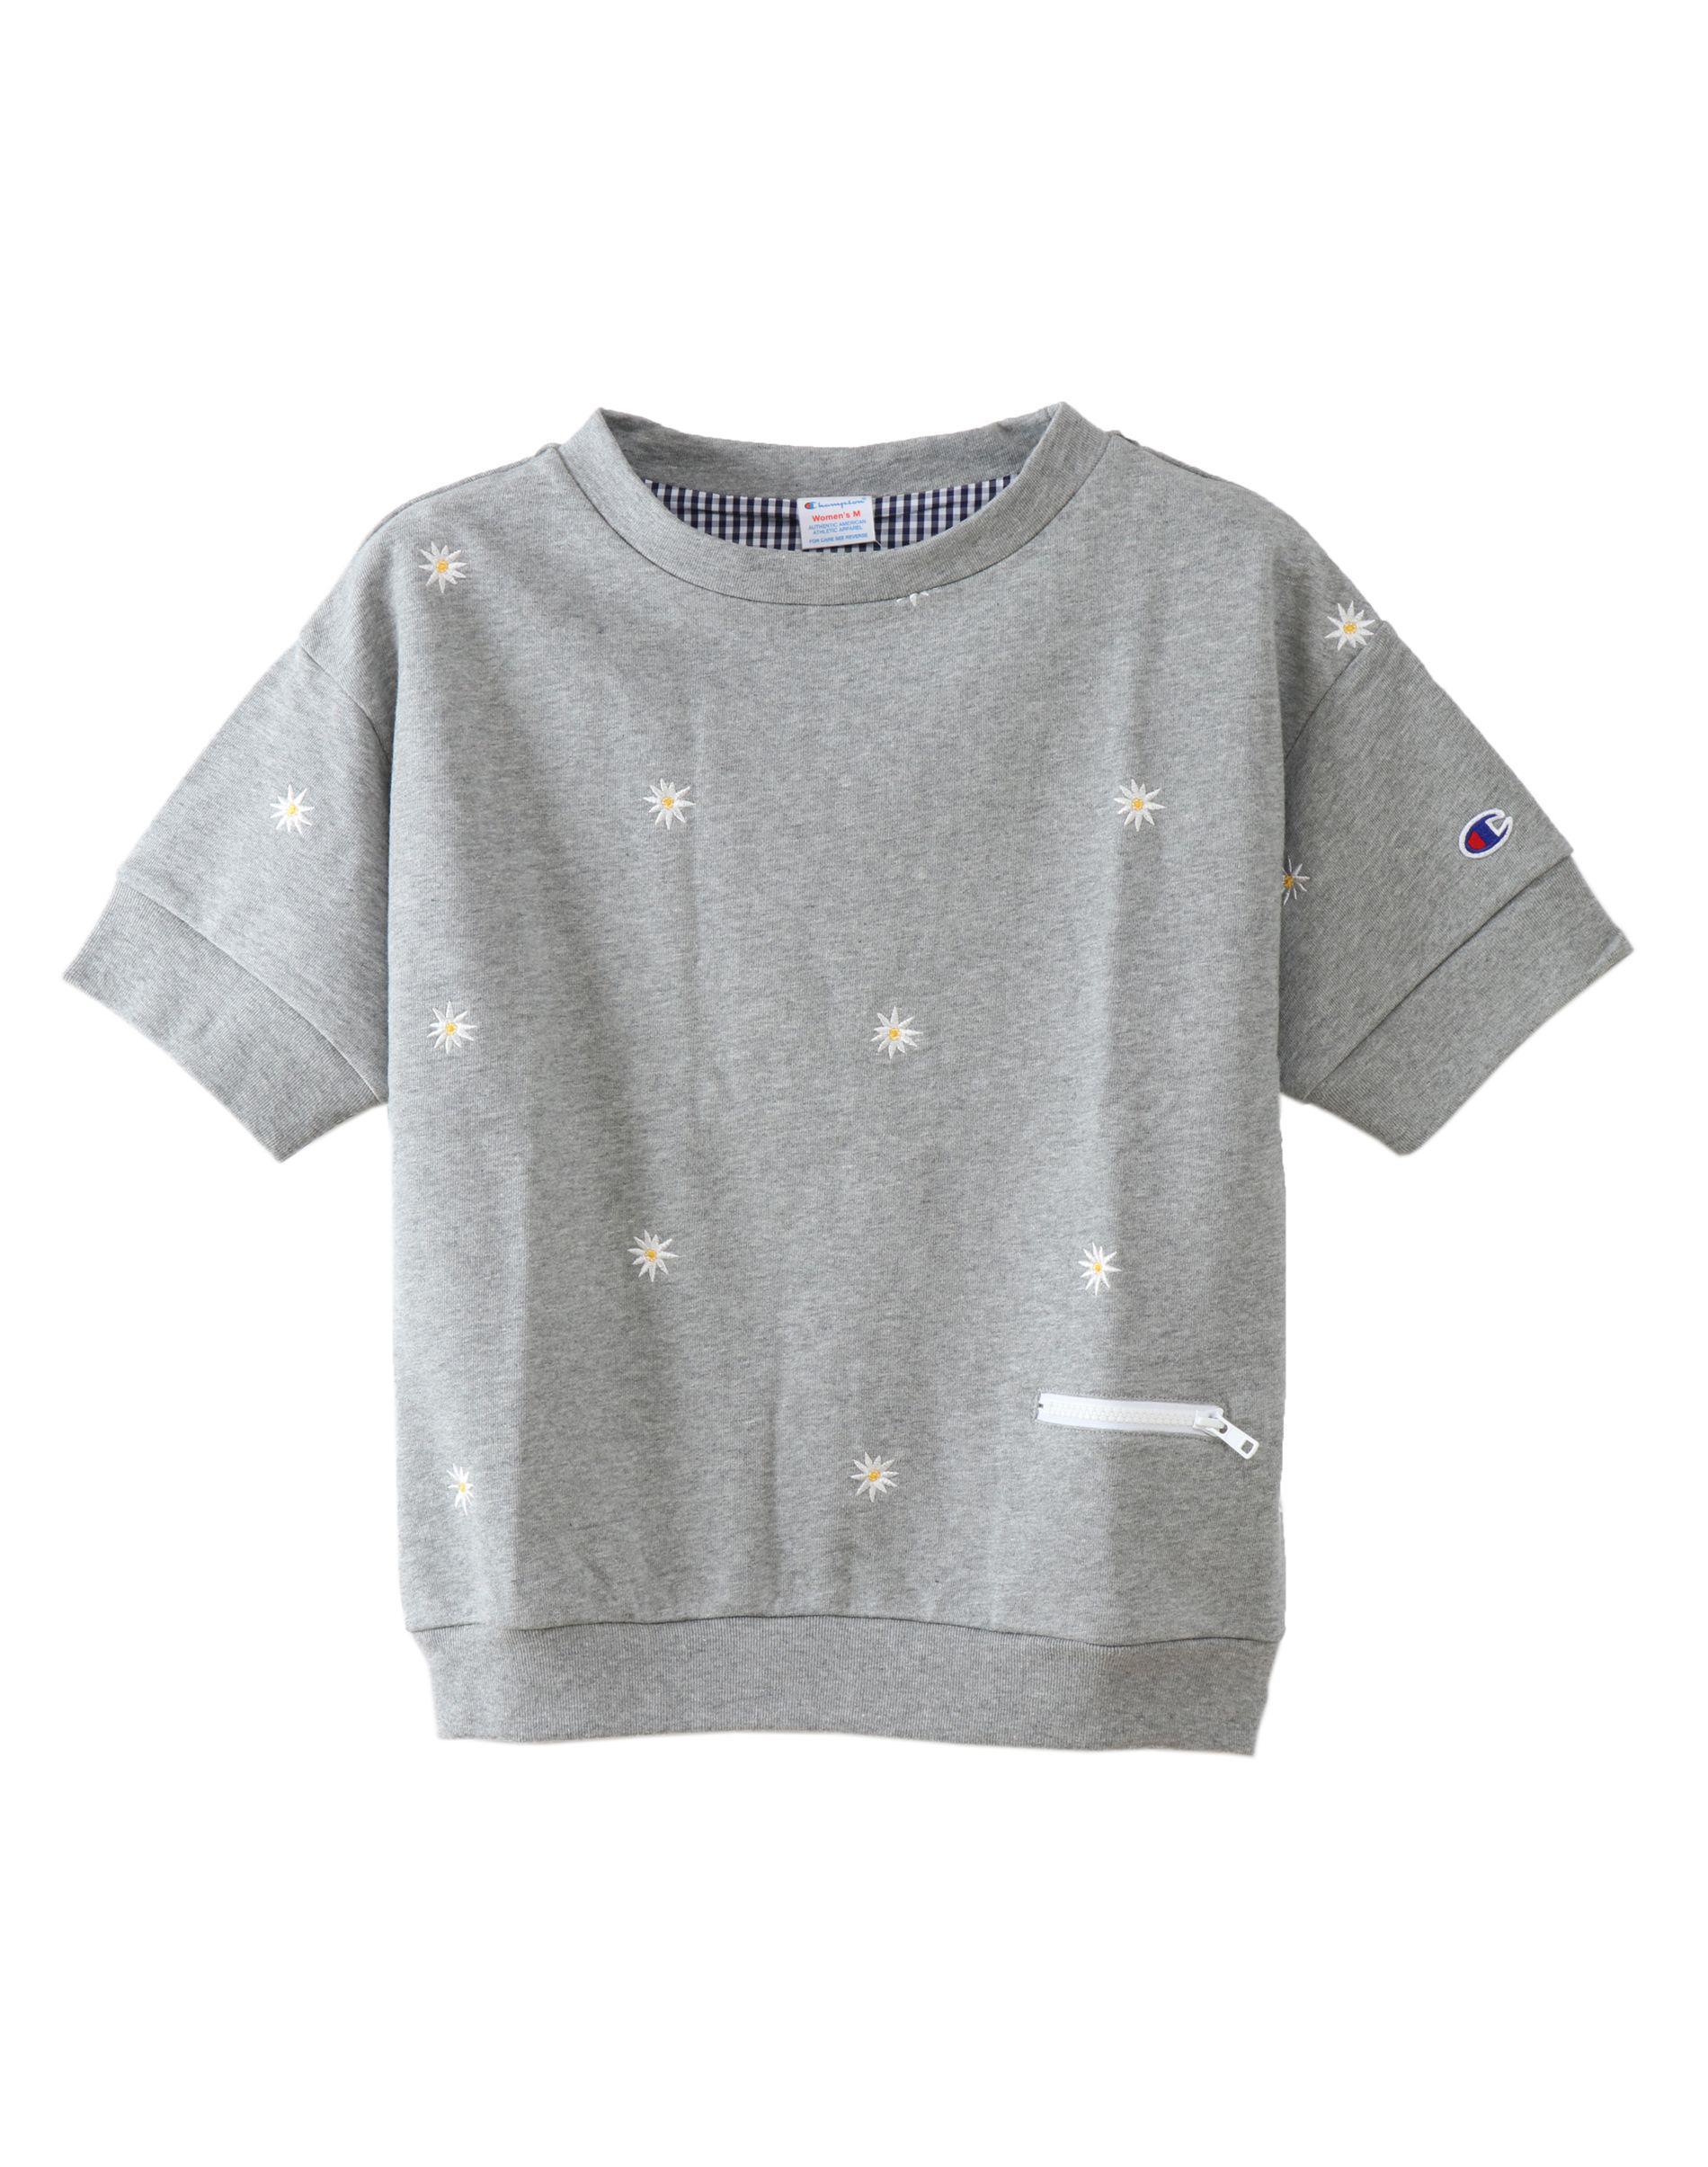 22560b2943ed Lyst - Champion Japan Premium Short-sleeve Sweatshirt in Gray